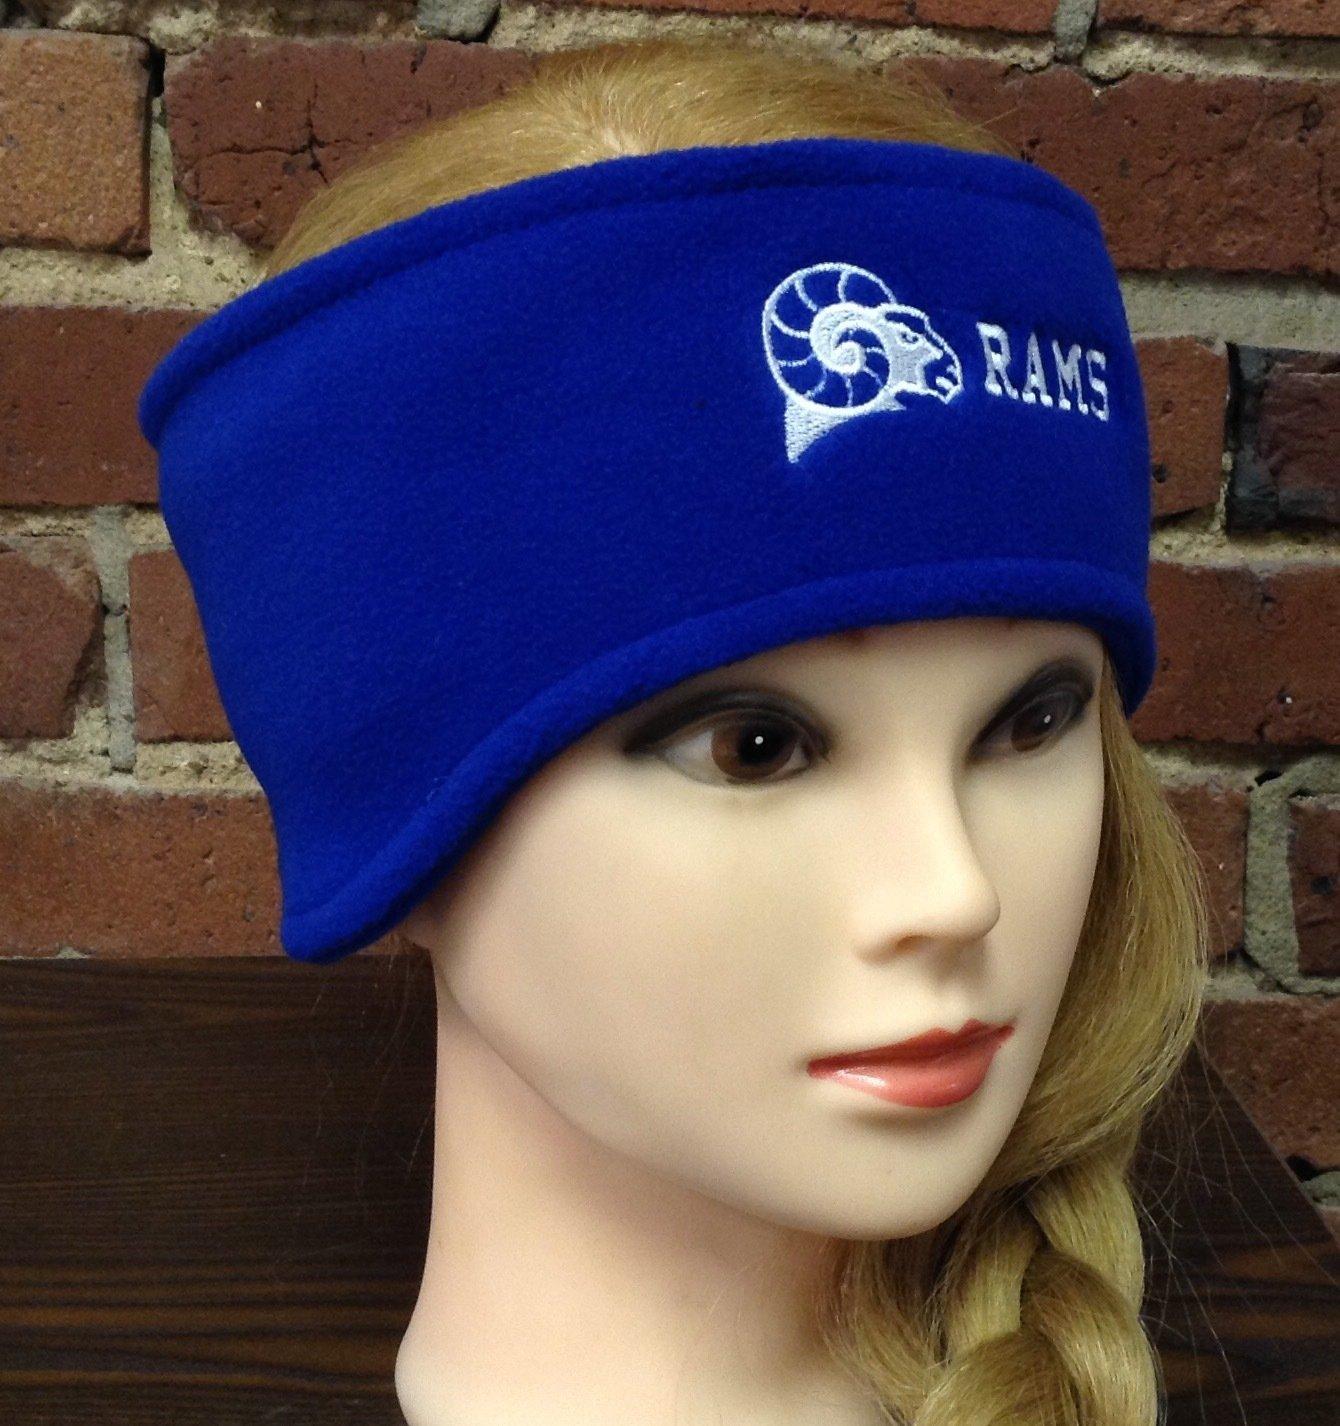 Headband with ear warmers, royal blue